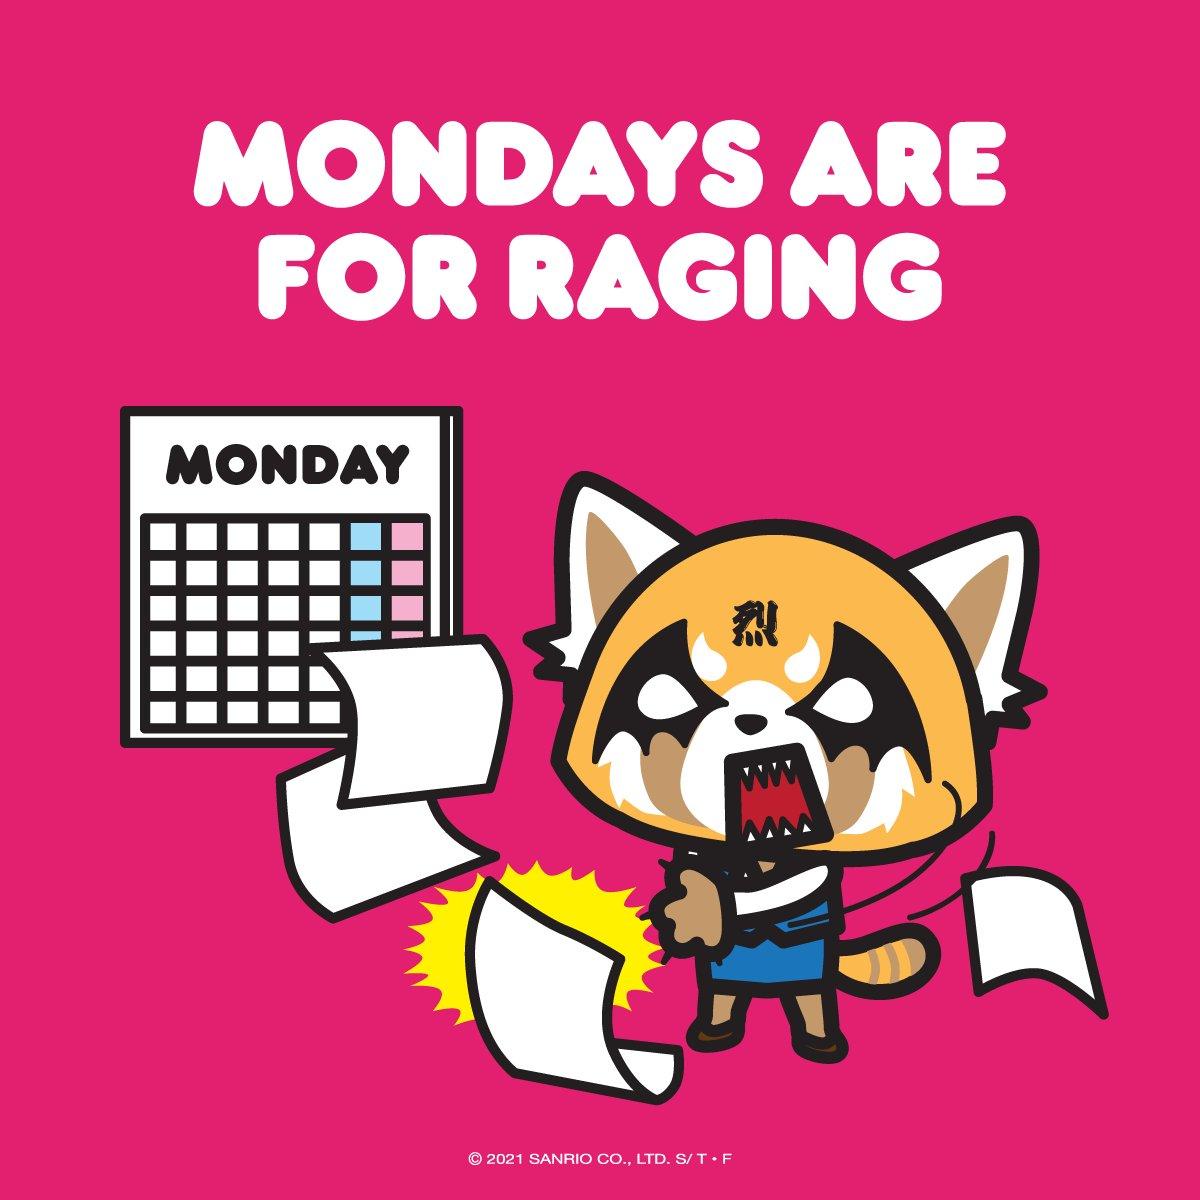 What else are Mondays for? 🔥 #mondaymotivation